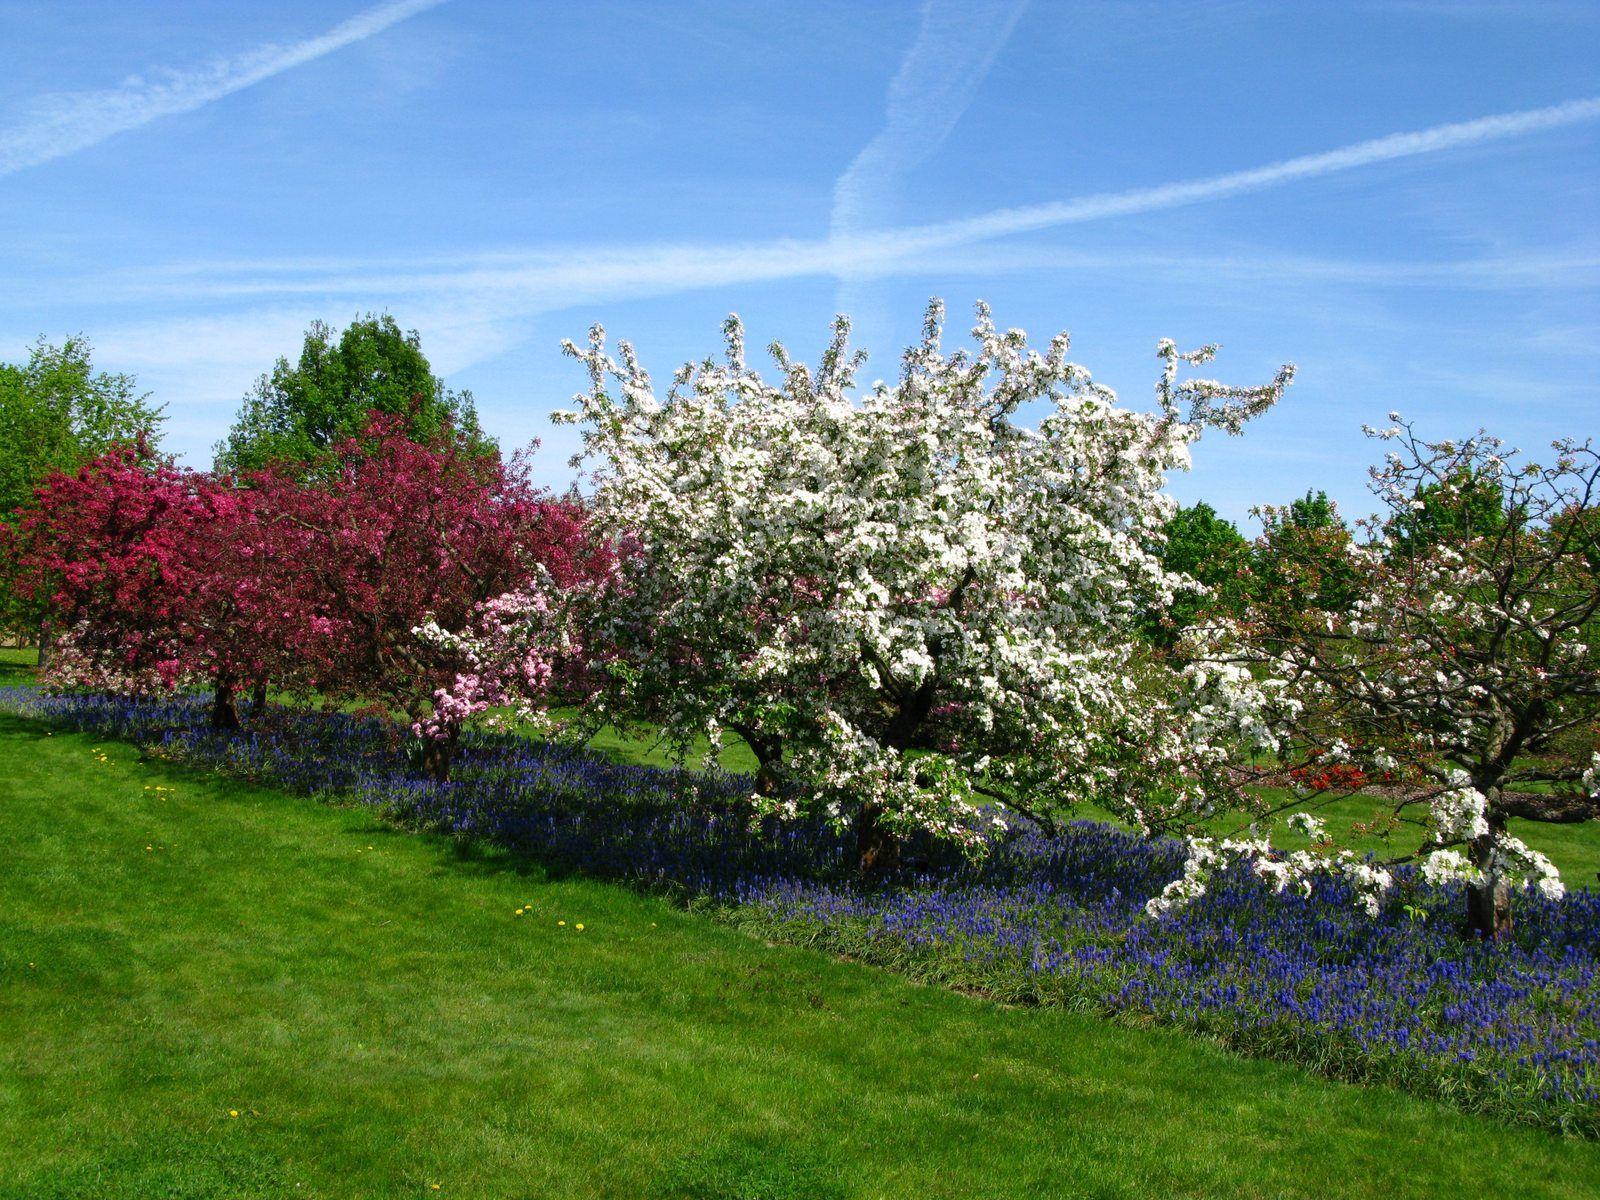 Gardenia Companion Planting What Are Good Companion Plants For Gardenia Apple Tree Gardening Planting Apple Trees Trees To Plant